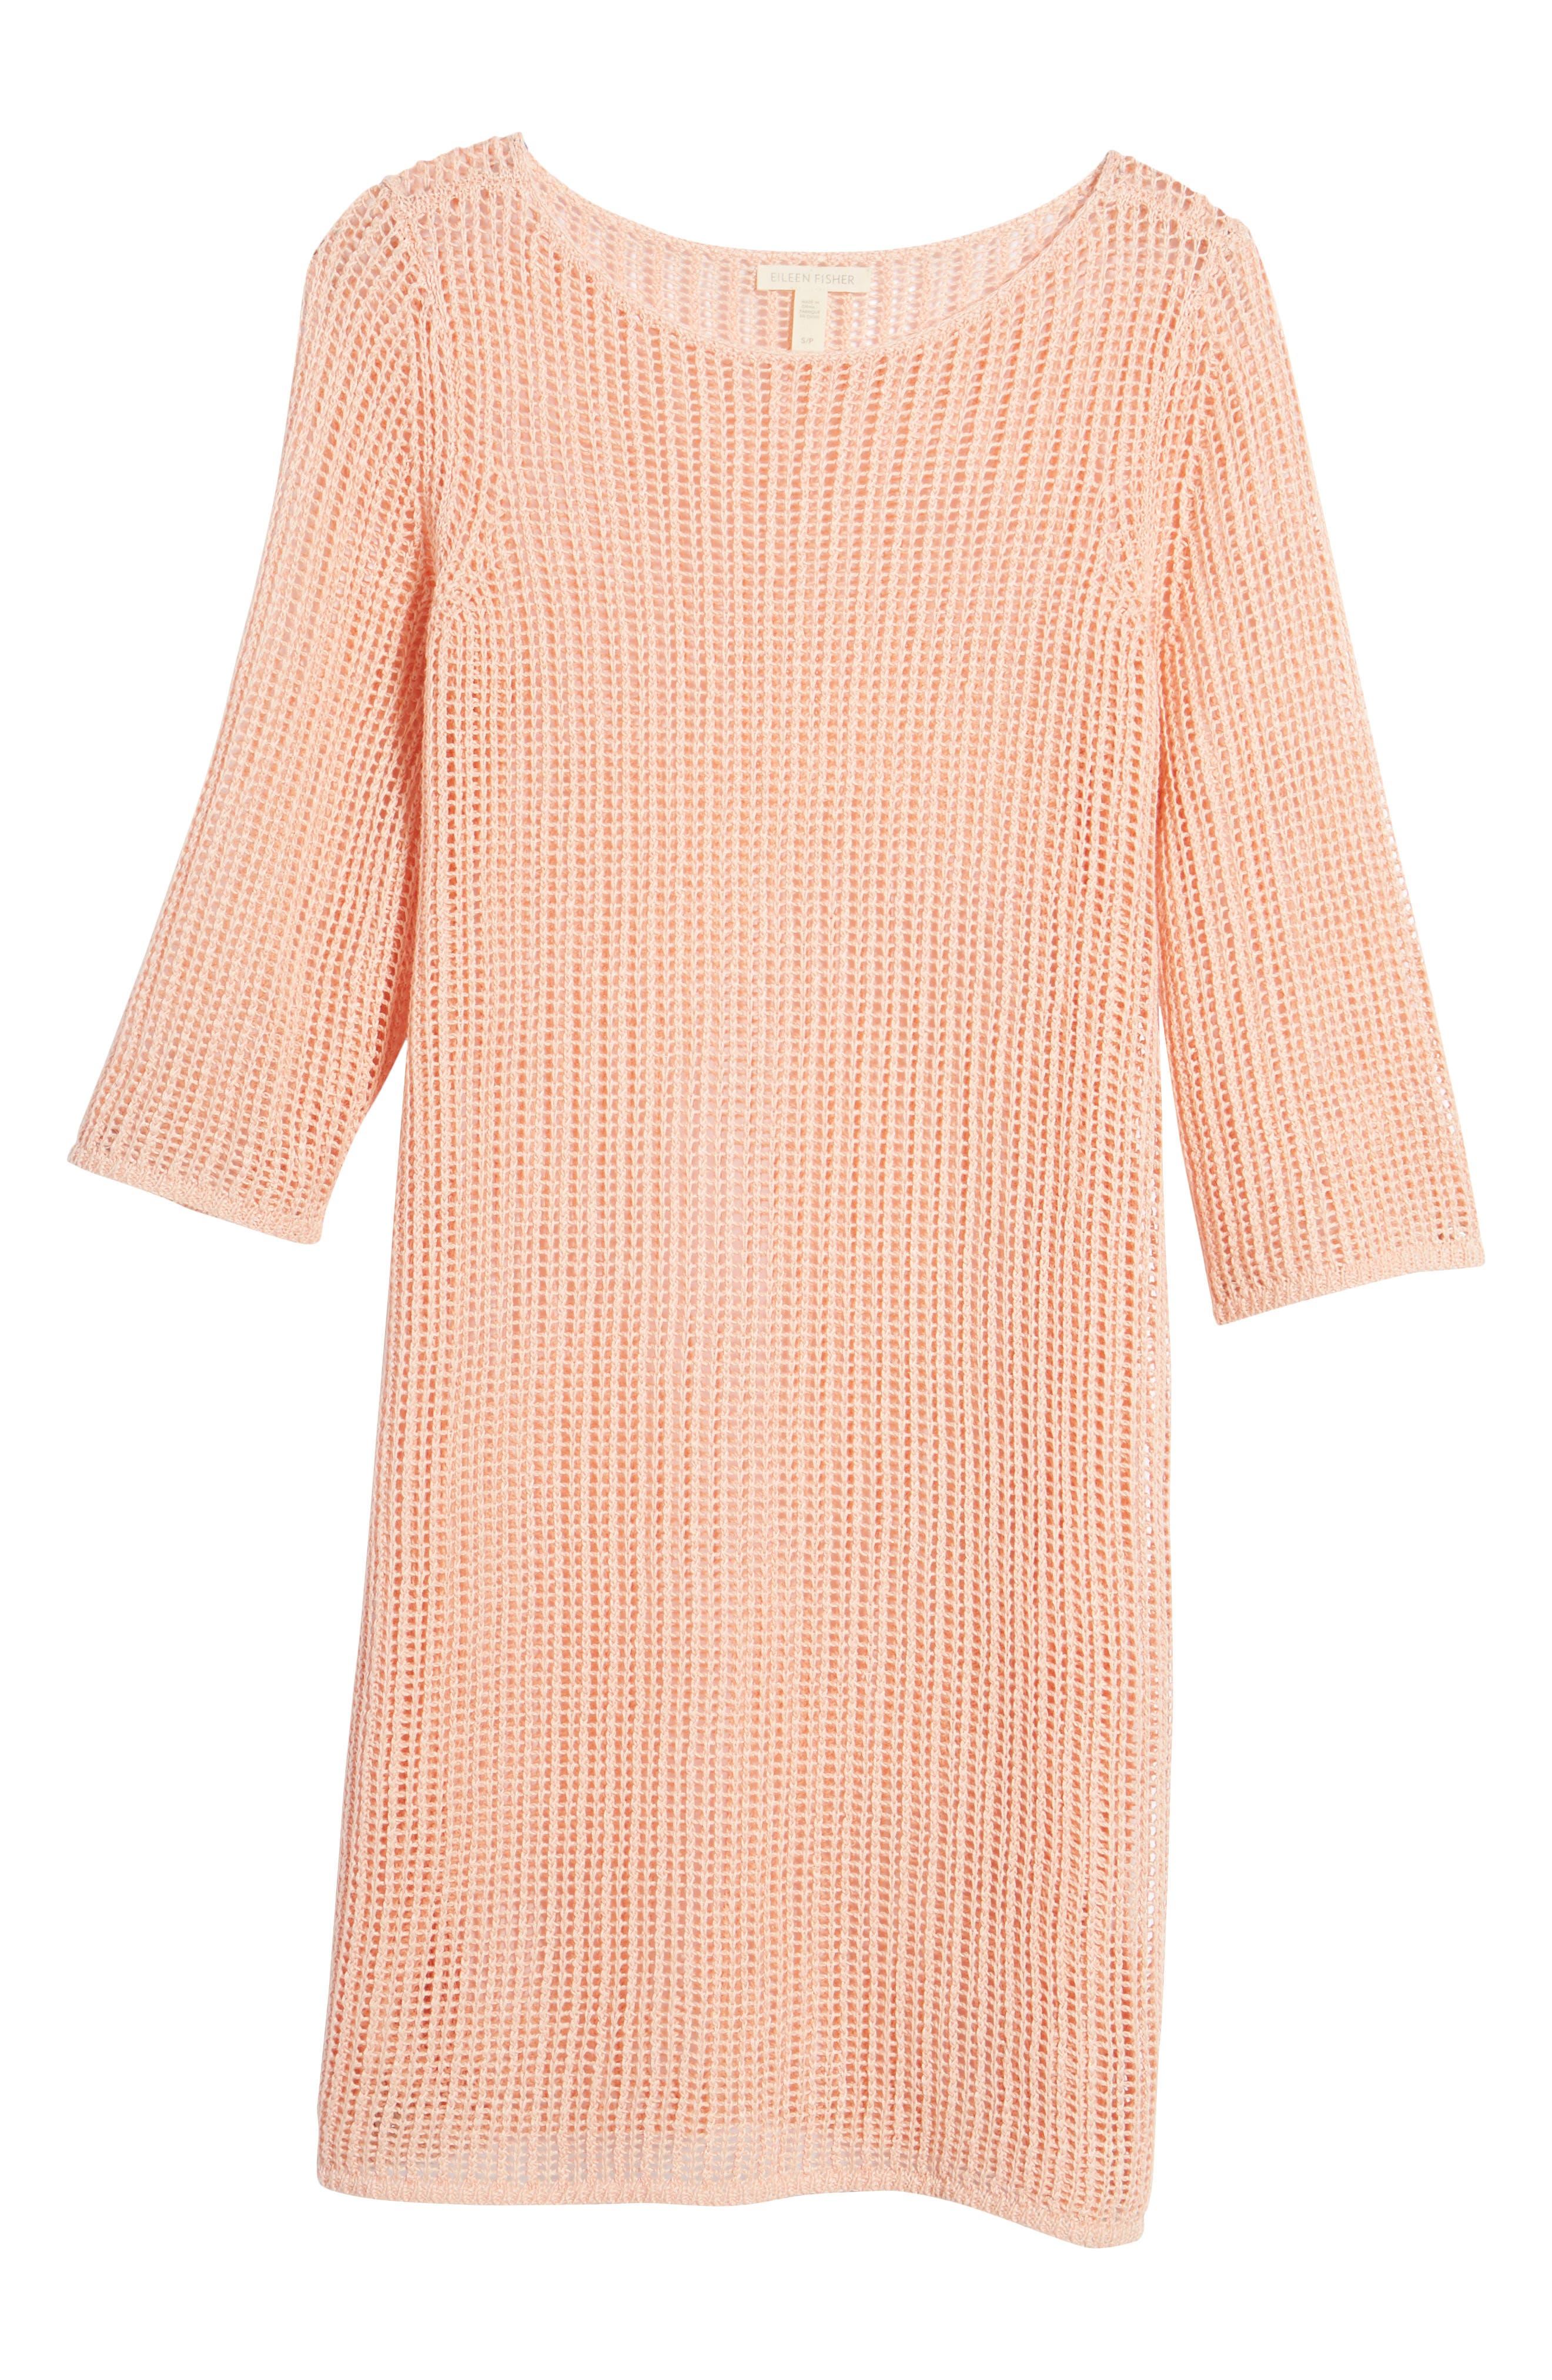 Organic Linen Tunic,                             Alternate thumbnail 7, color,                             Petal